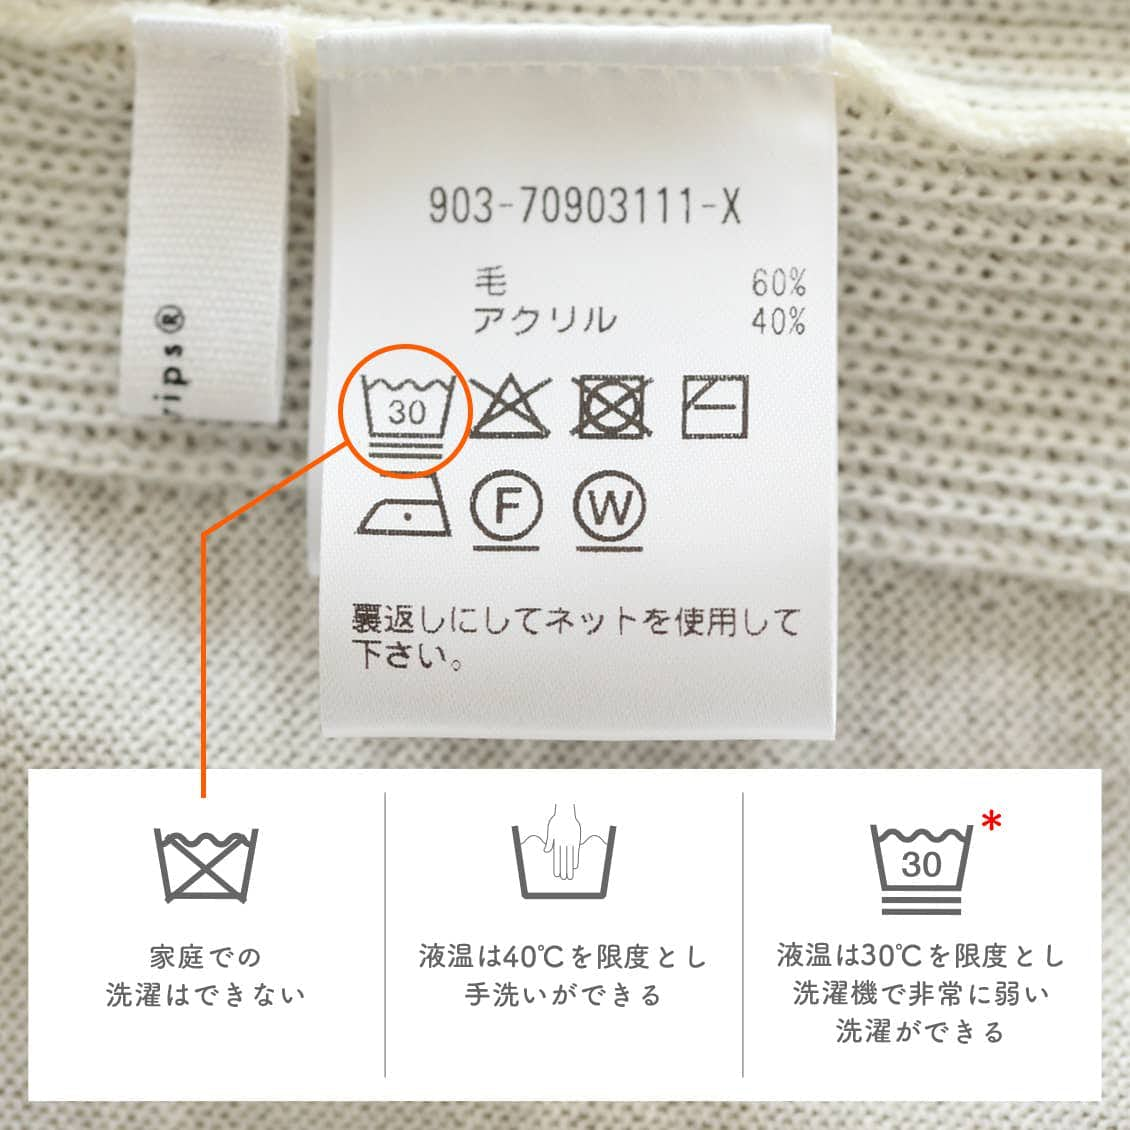 c8a049565d20 ニット・セーターの洗濯方法プロが教える洗濯機・手洗いと干し方 - 北欧 ...